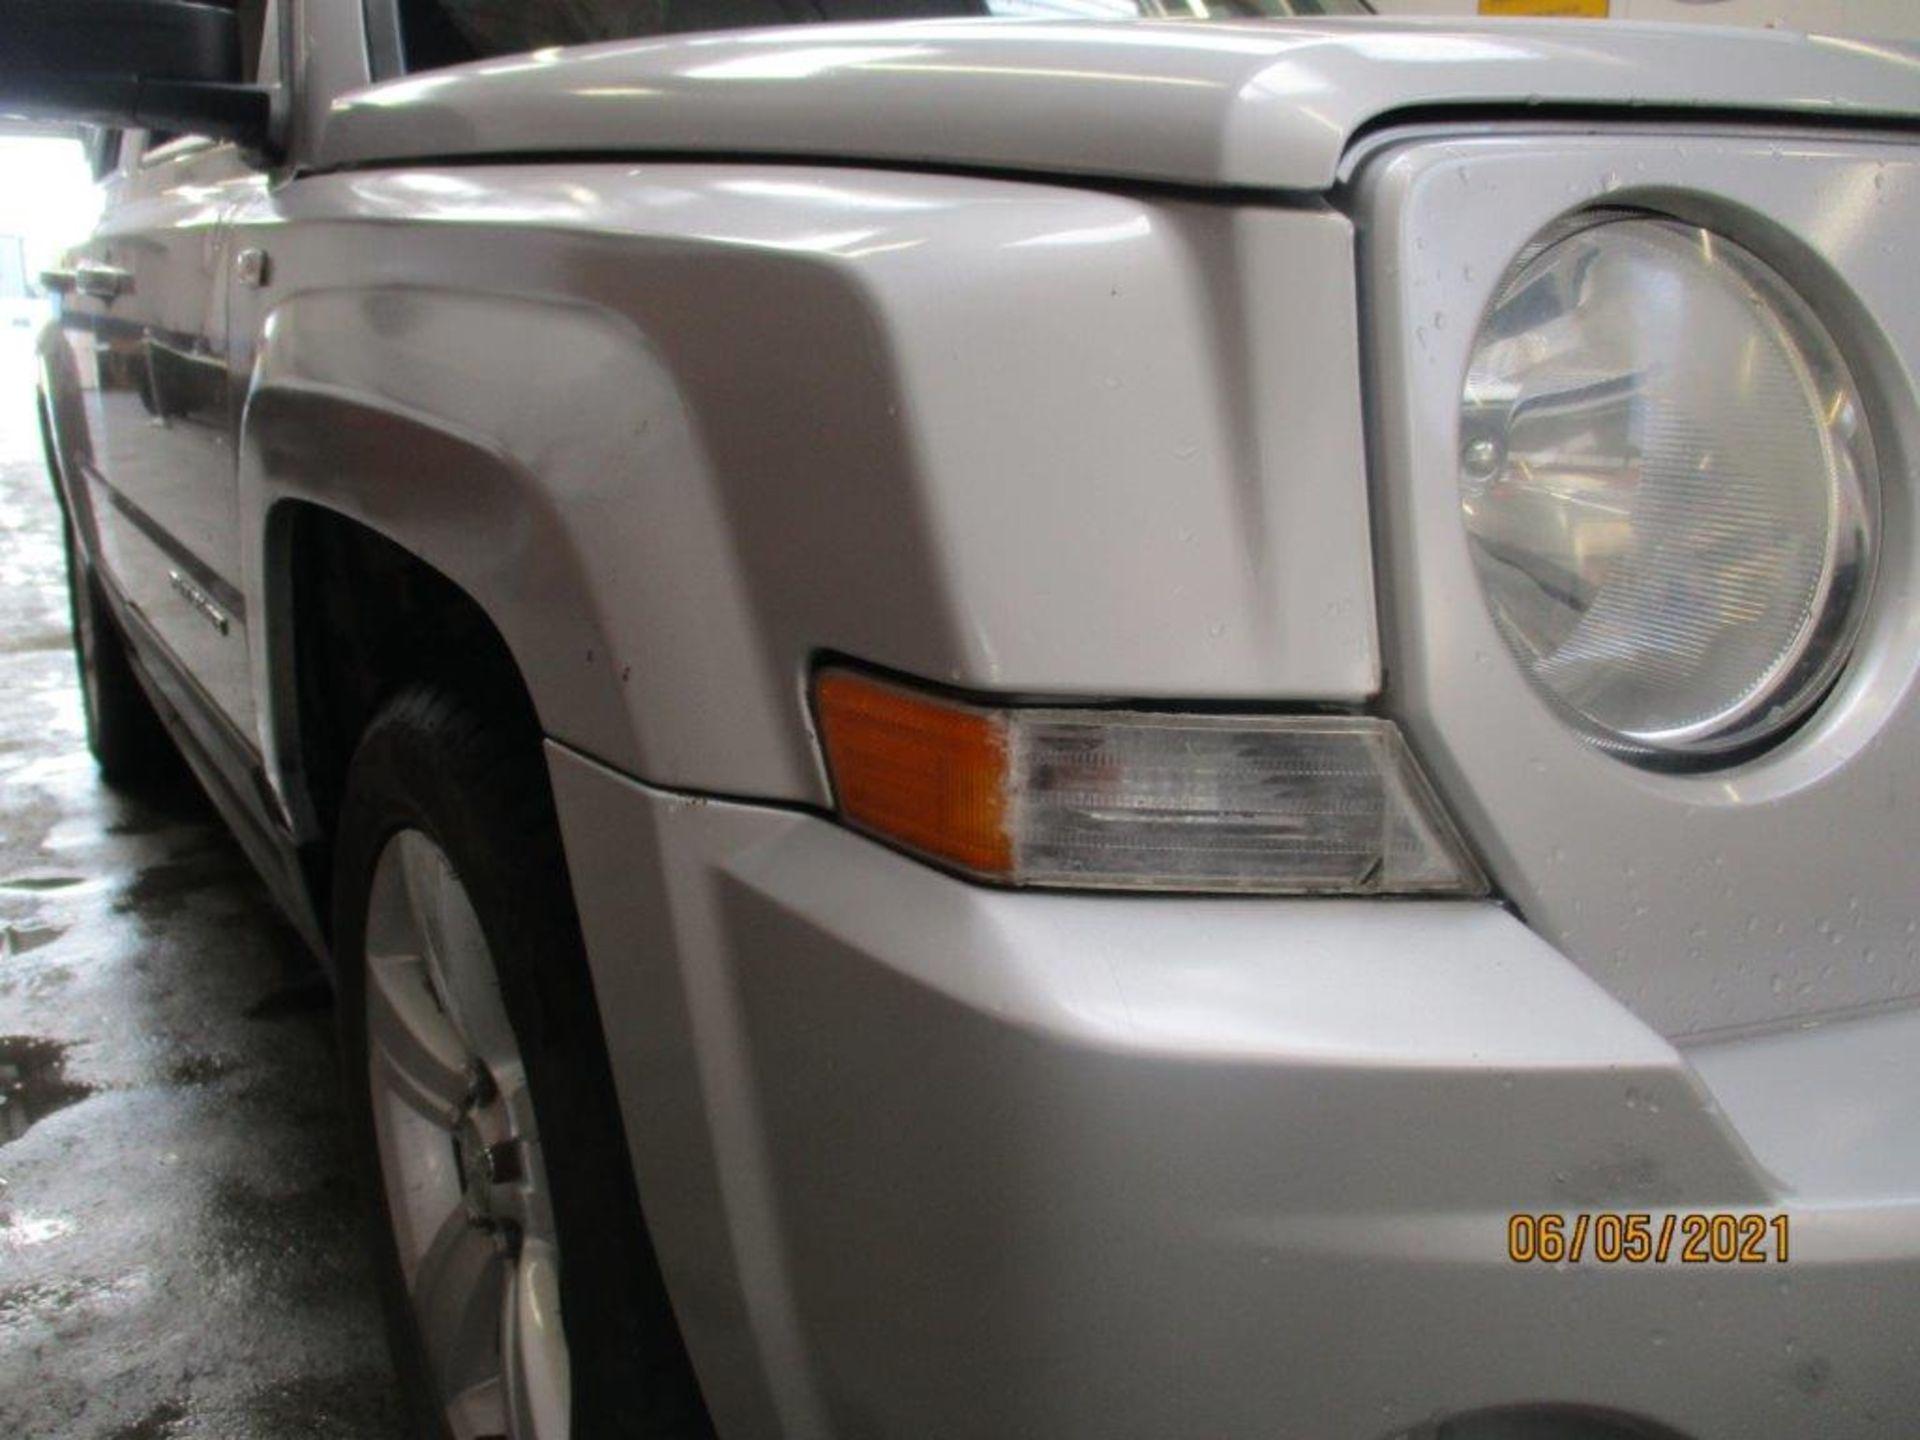 11 11 Jeep Patriot LTD CRD - Image 14 of 16